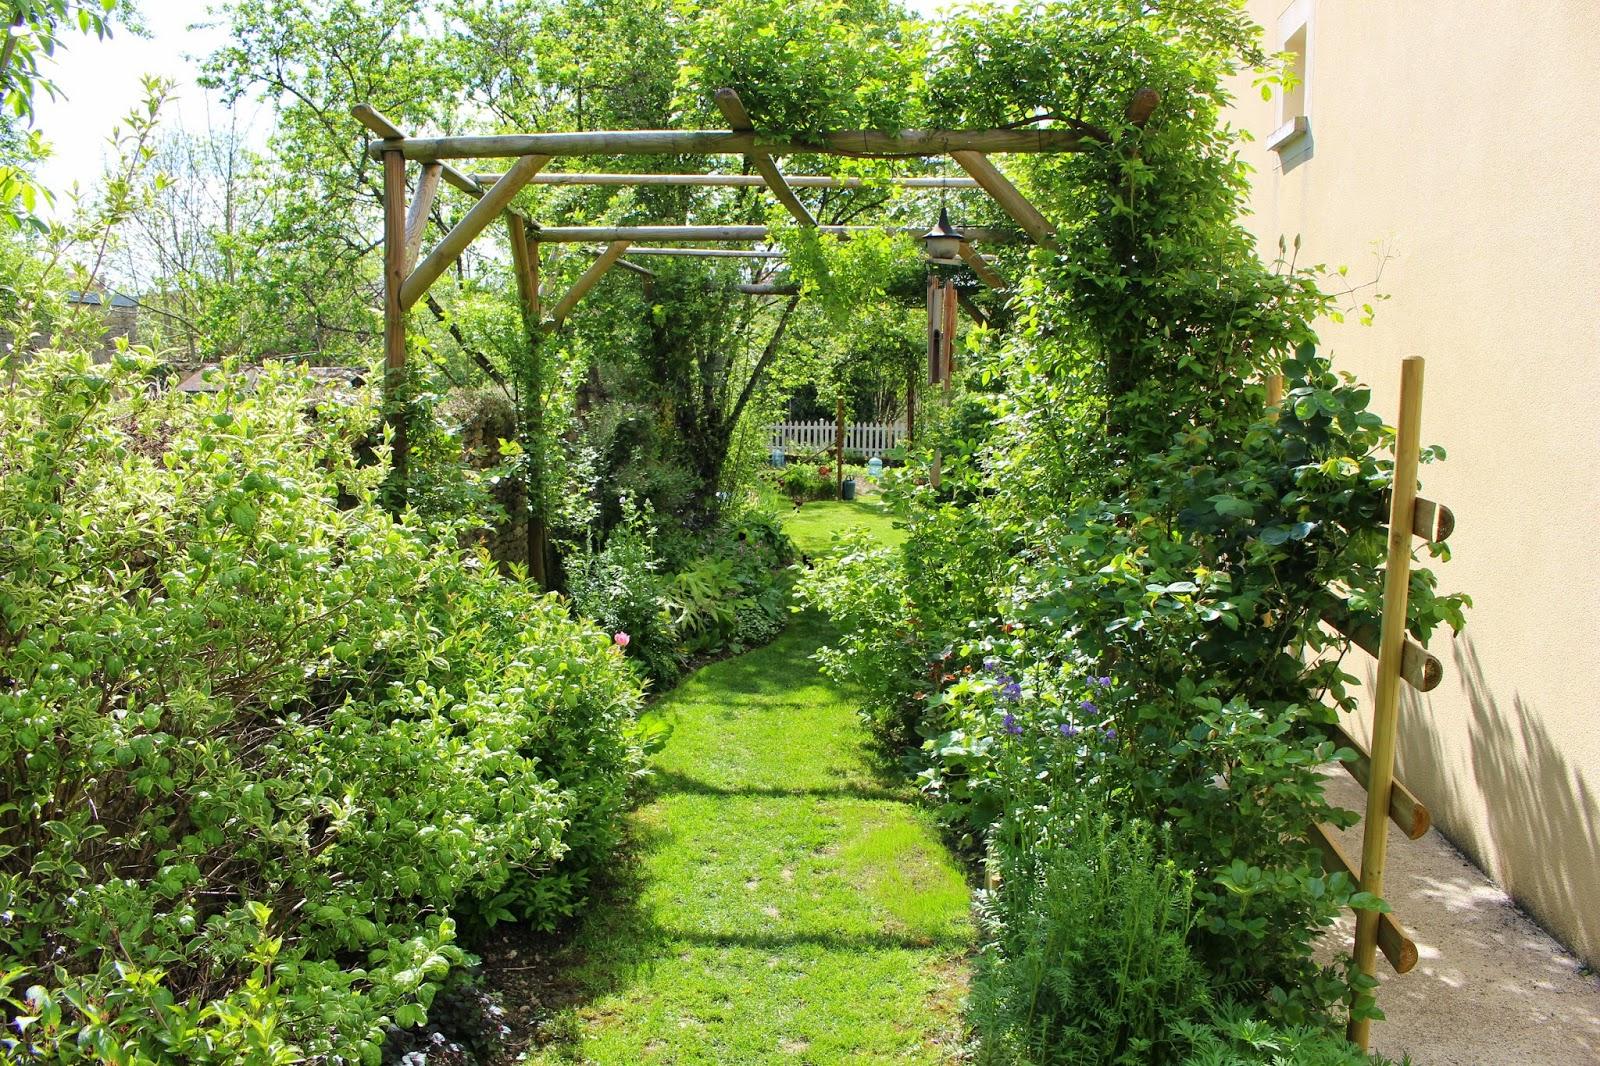 Notre jardin secret deco co for Jardin secret 78